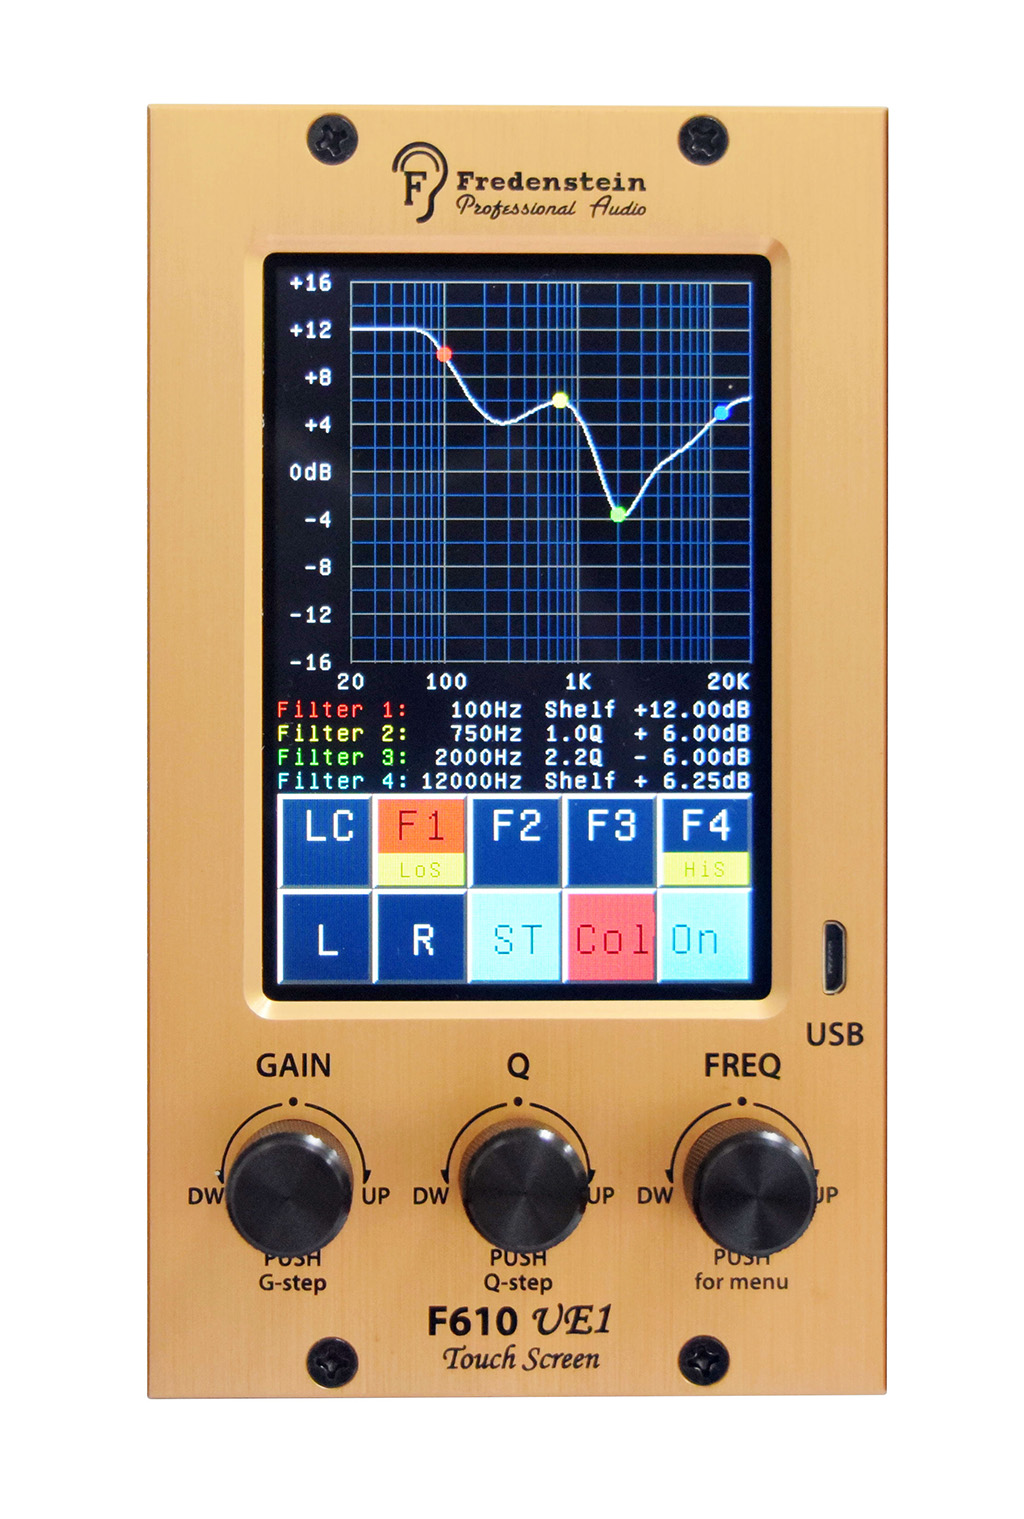 News: Fredenstein F610 UE-1 Stereo-Equalizer